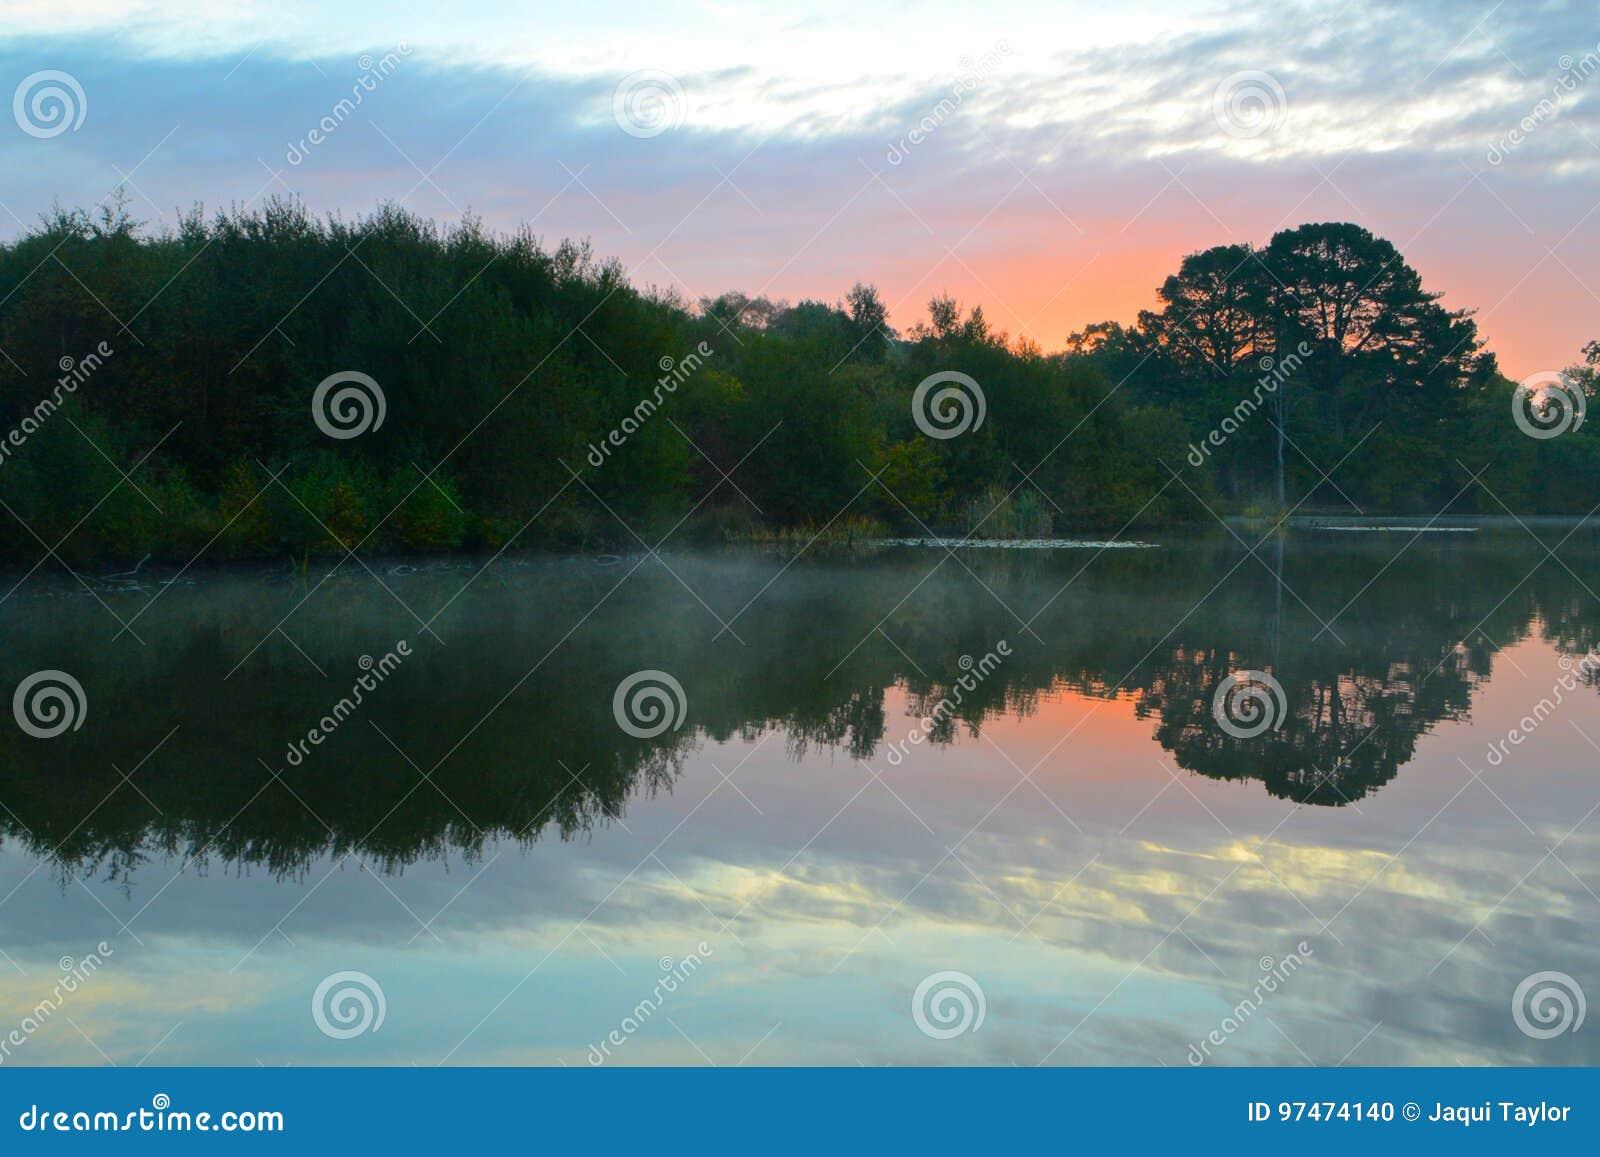 Sunrise at the Ornamental Pond, Southampton